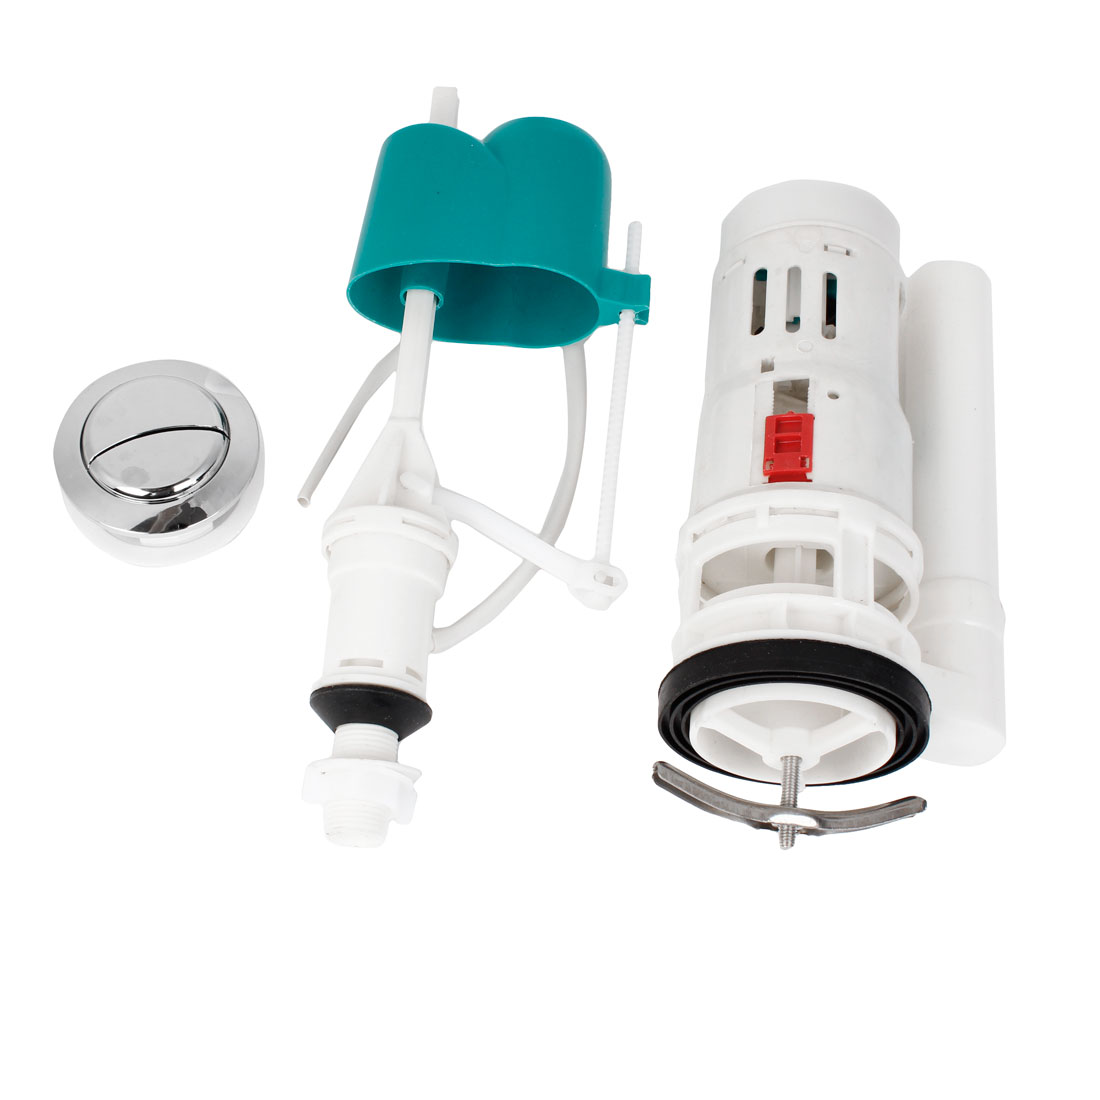 Household Flush Toilet Plastic Outlet Valve Push Button Cistern Fittings Set